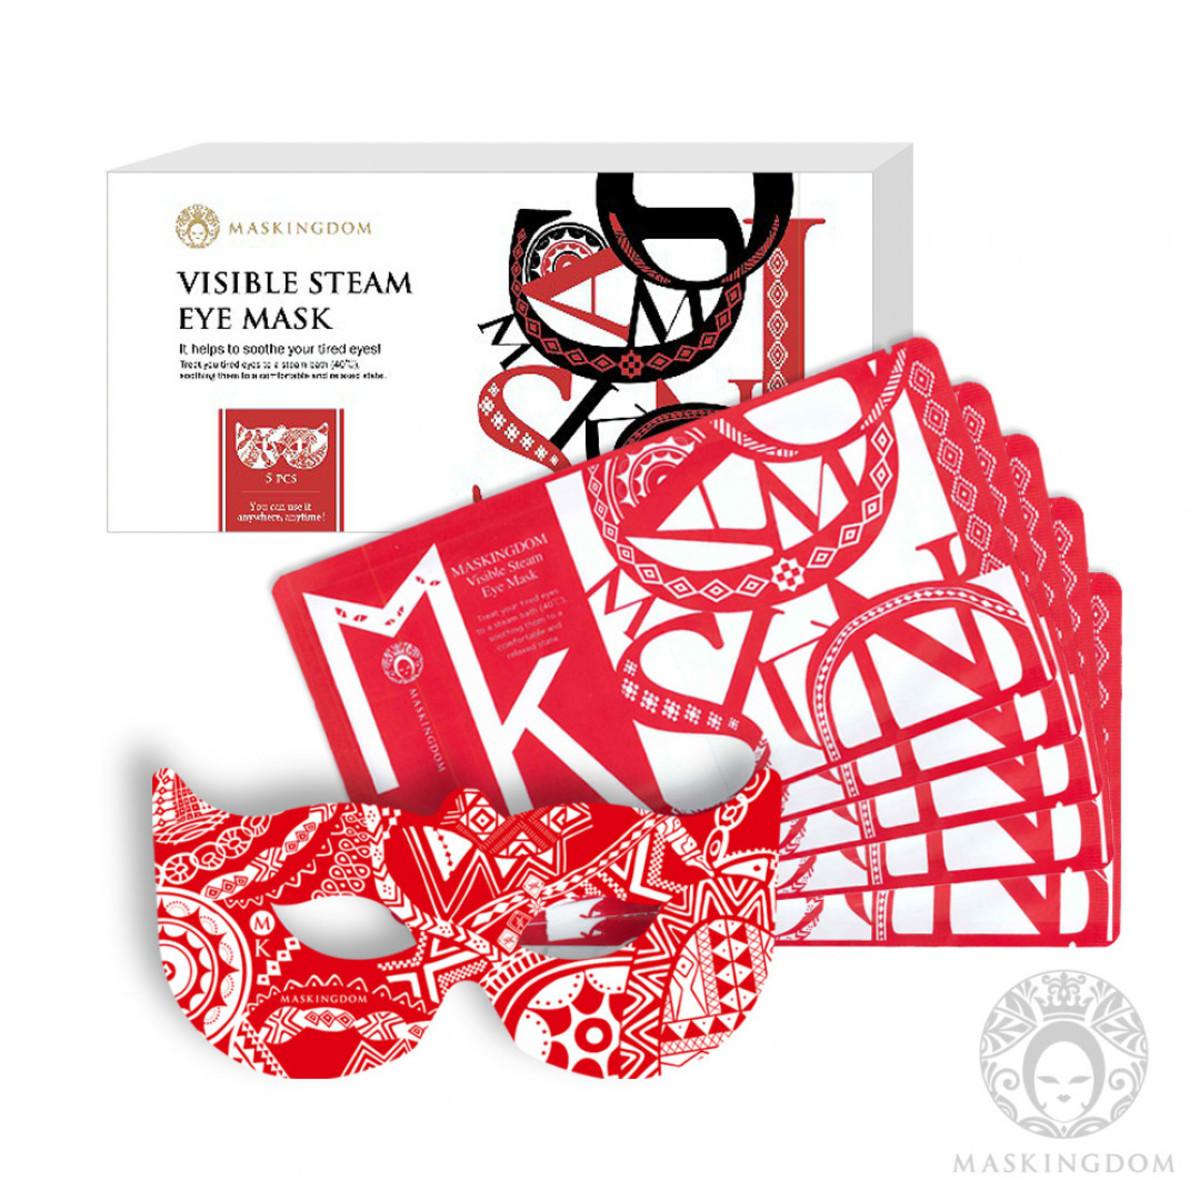 Visible Steam Eye Mask (Heat 40˚C) 5pcs/Box-(Red)